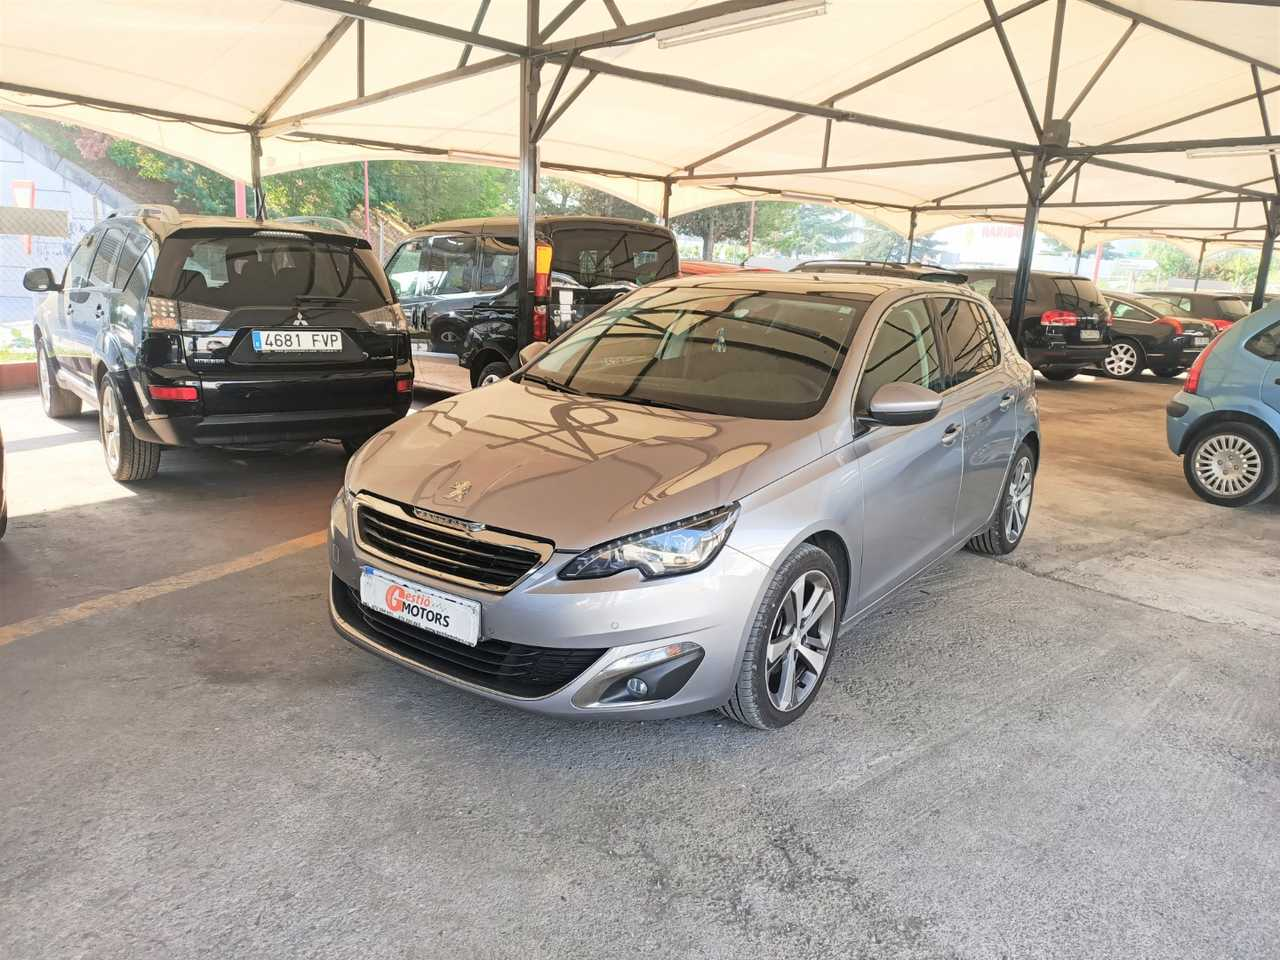 Peugeot 308 nuevo 308 ALLURE 1.6 eHDI 115   - Foto 1